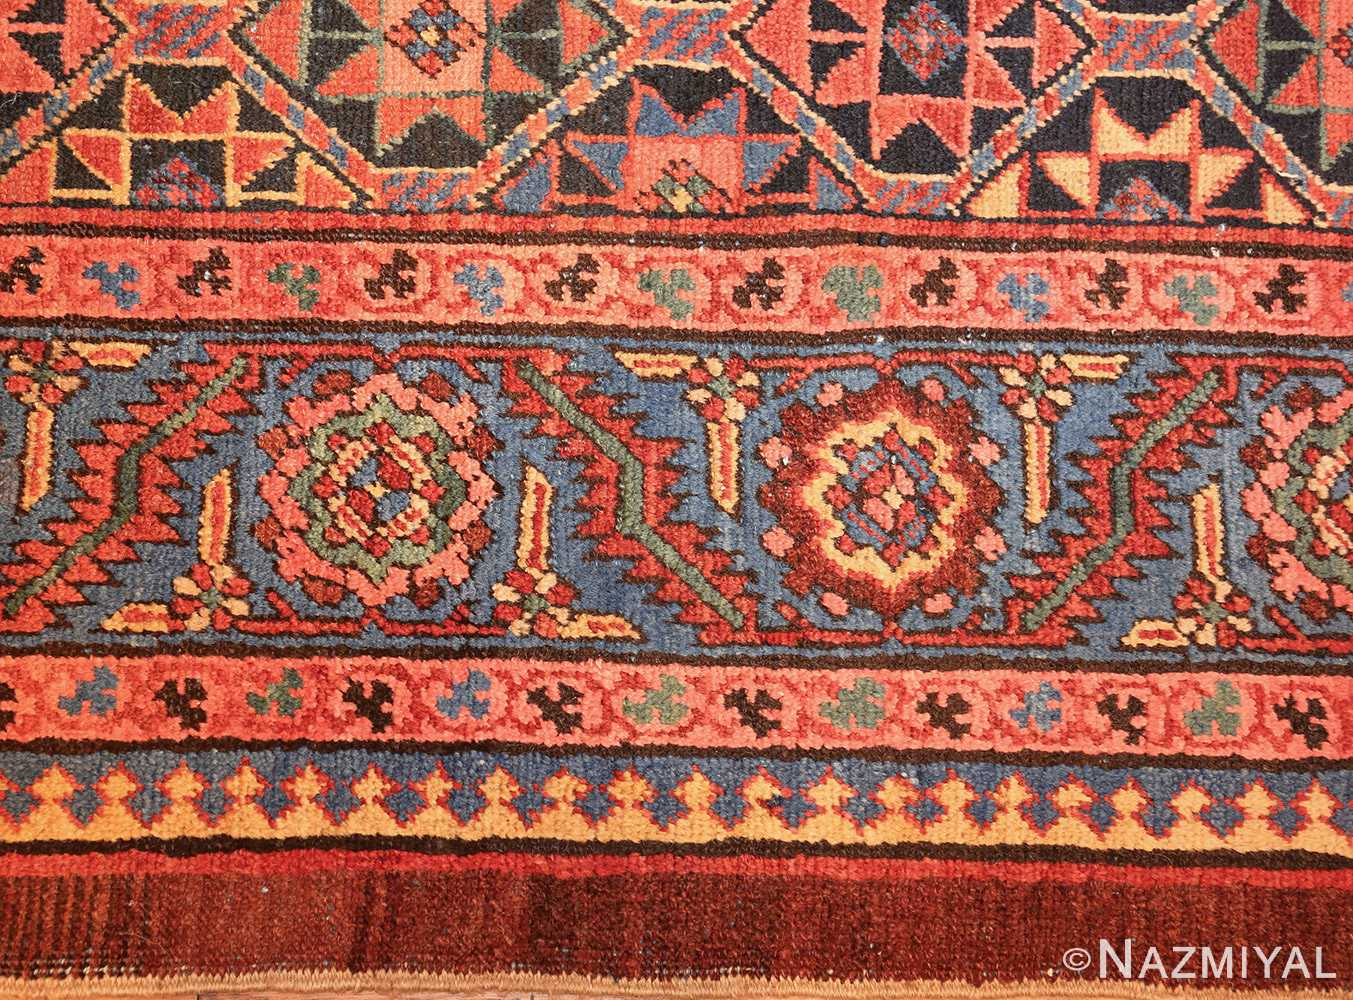 antique persian bakshaish gallery rug 45892 border Nazmiyal